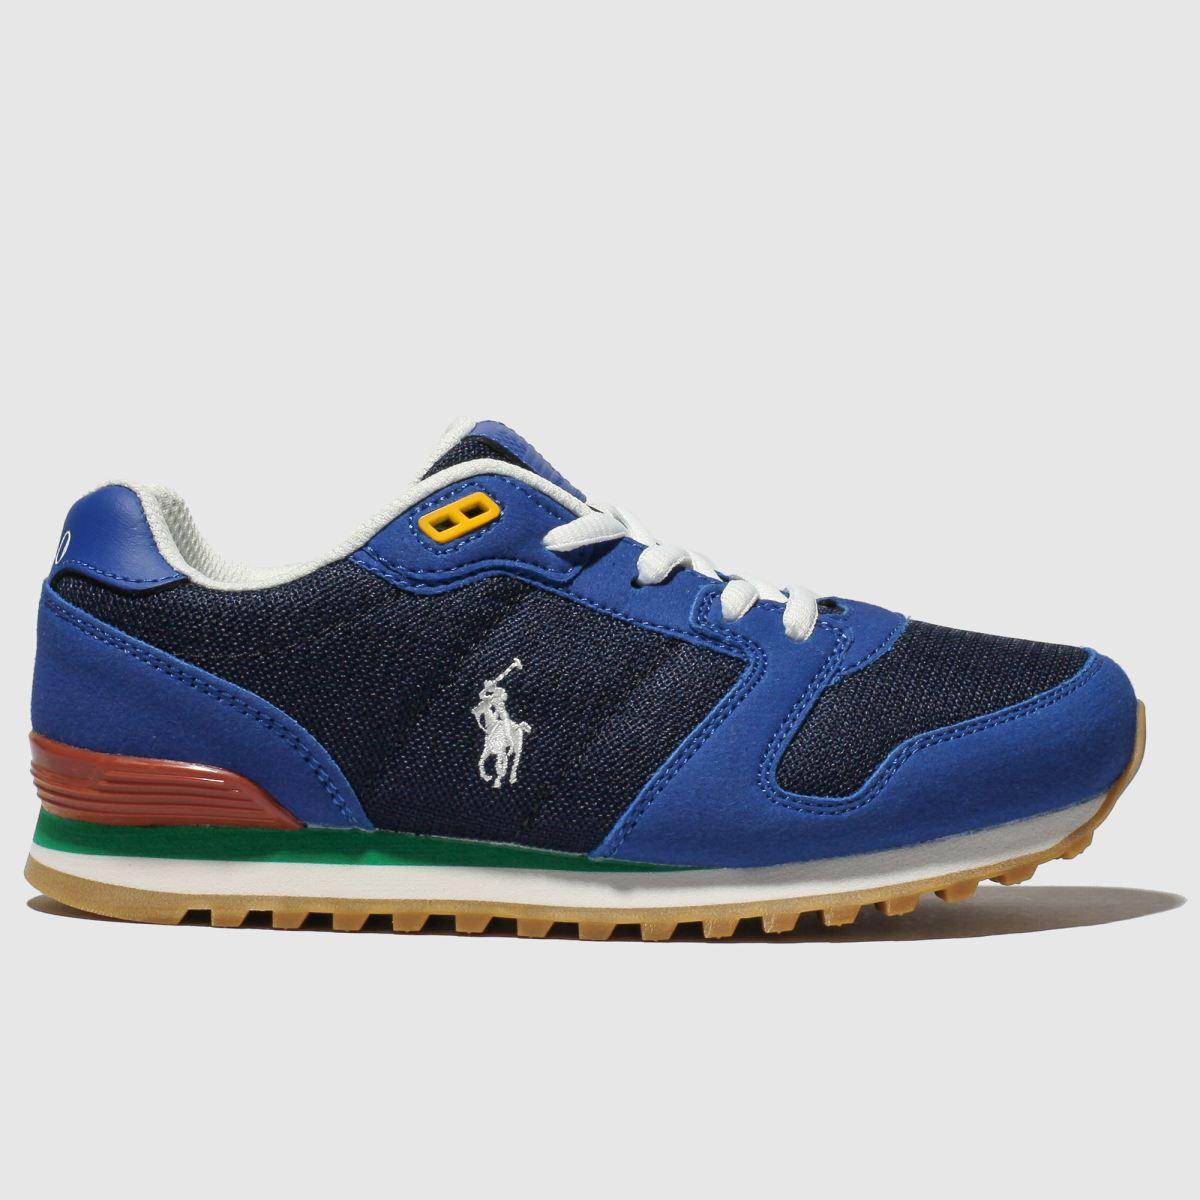 Polo Ralph Lauren Multi Oryon Shoes Youth